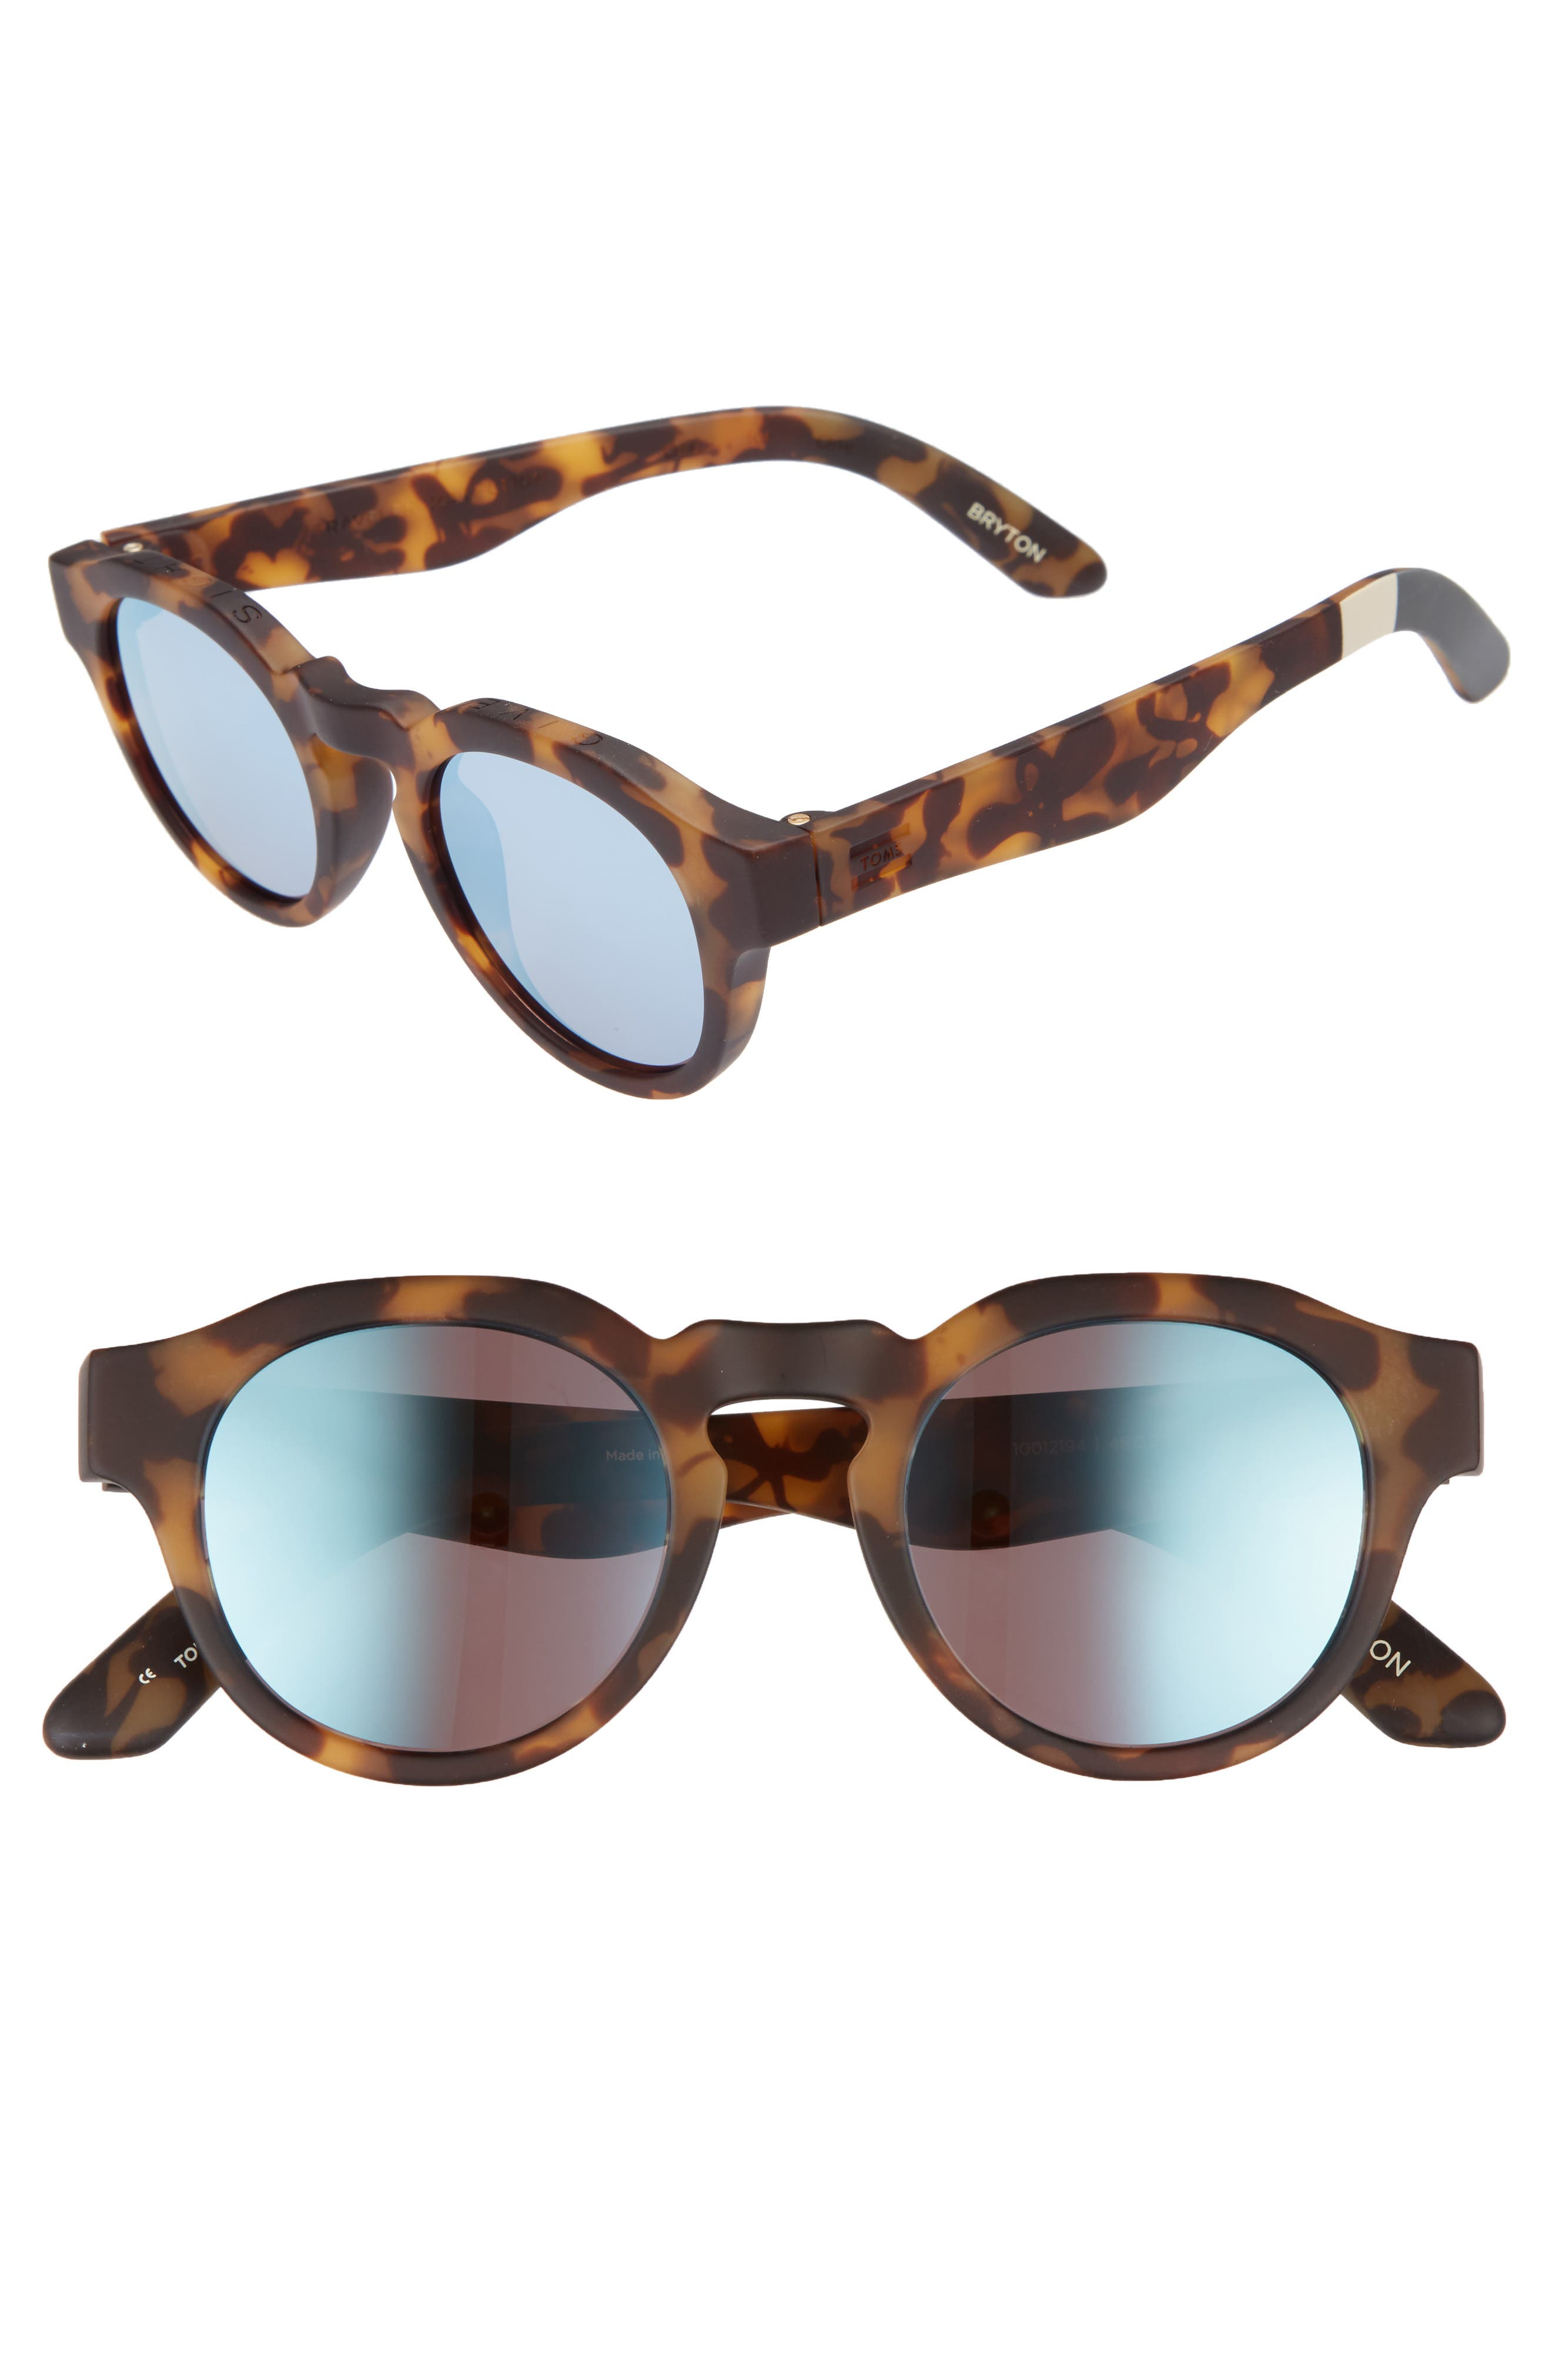 Bryton 48mm Sunglasses,                             Main thumbnail 1, color,                             200